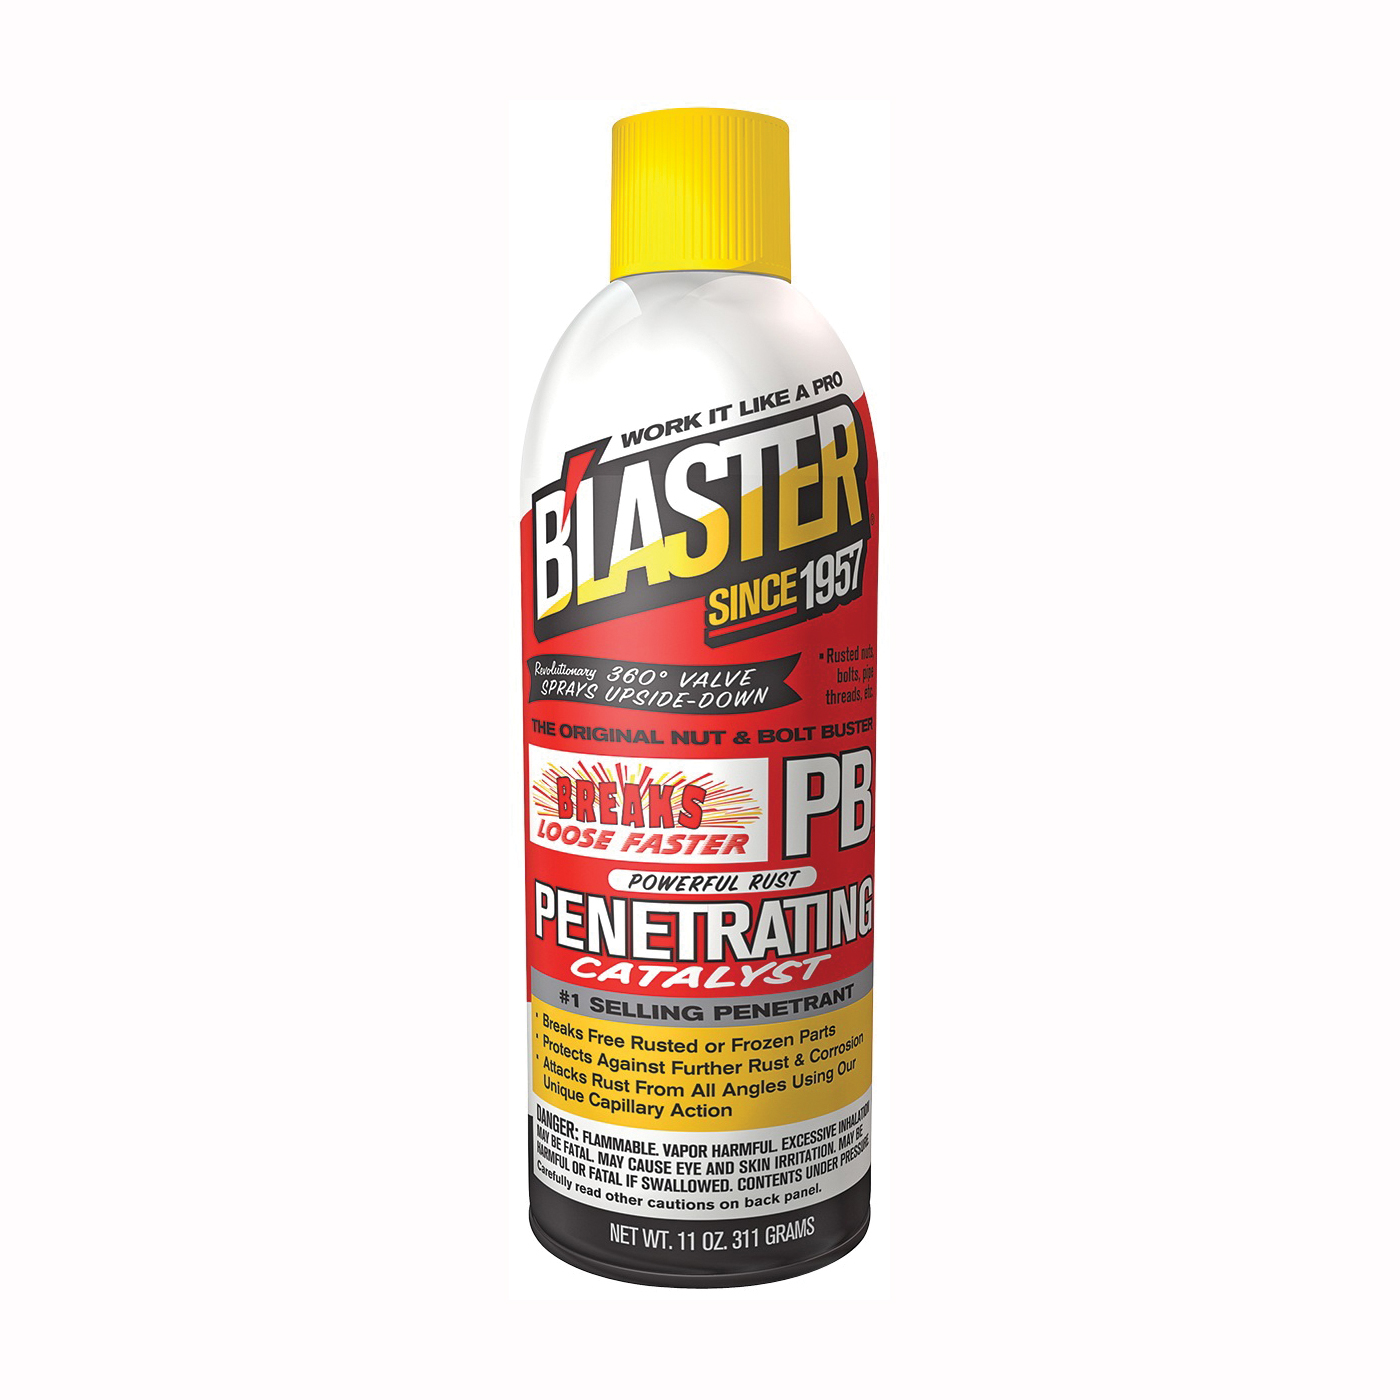 Picture of B'laster 16-PB Penetrant, 11 oz Package, Aerosol Can, Liquid, Heavy Aromatic